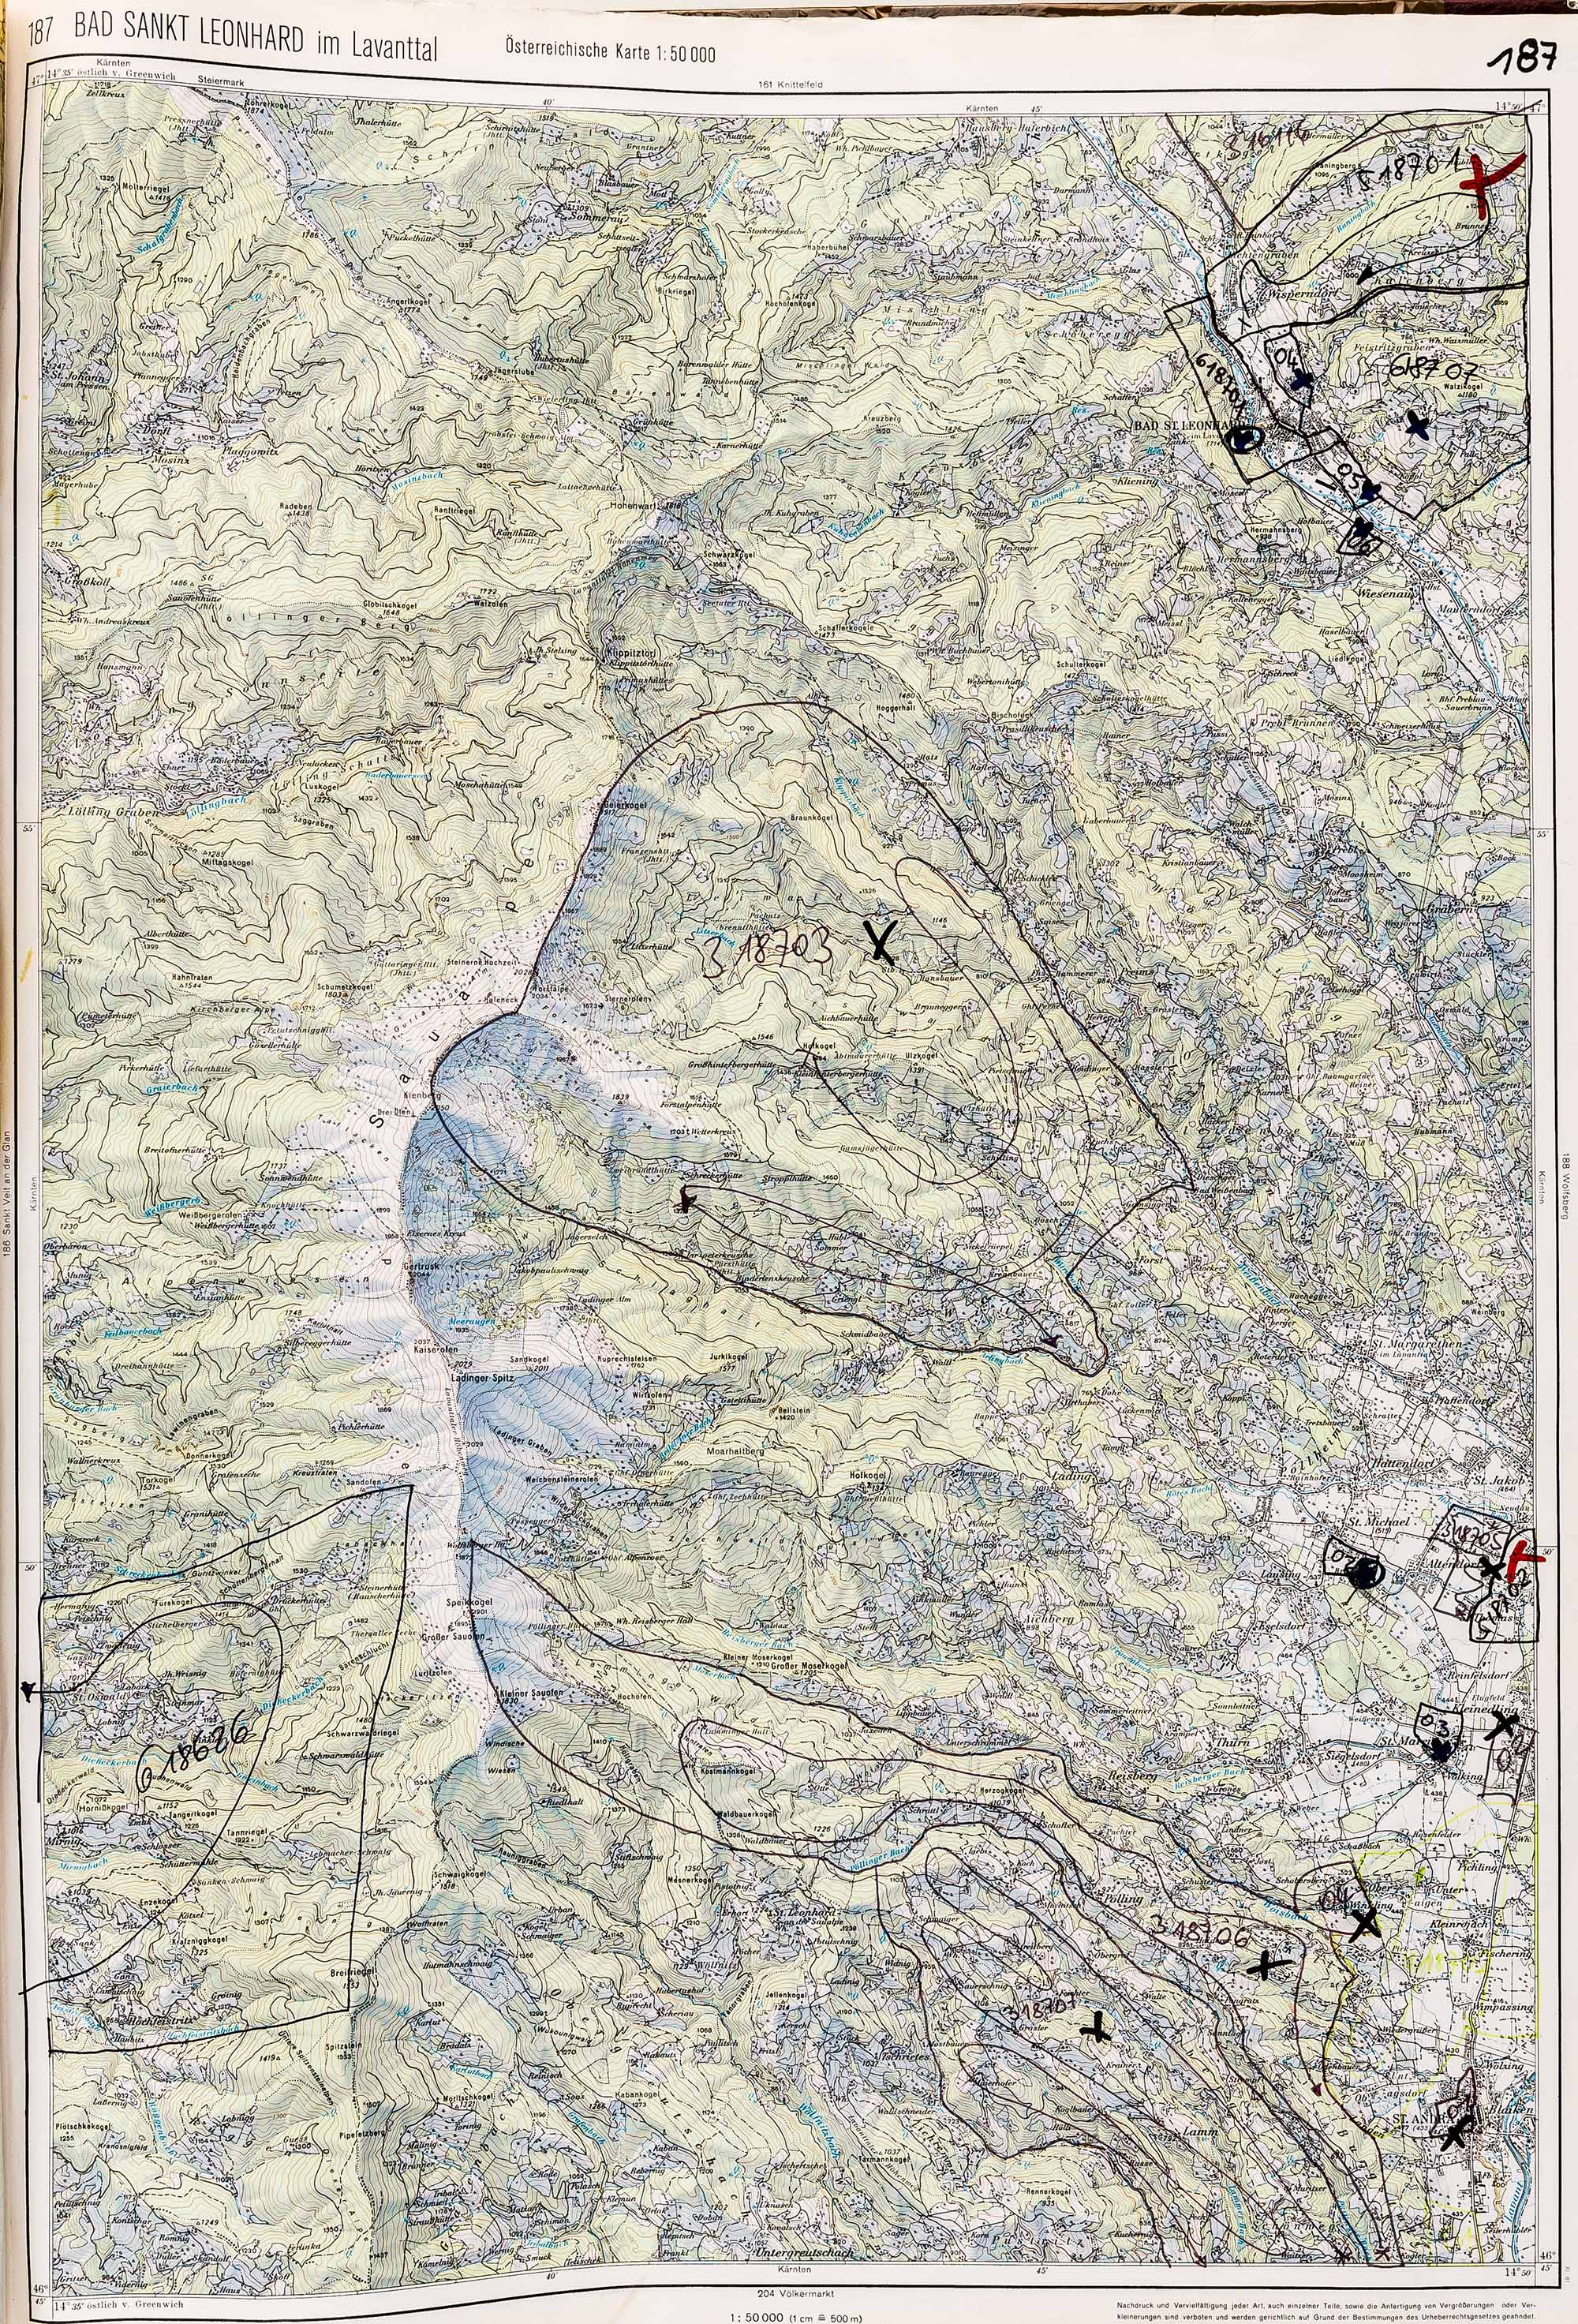 1983-1986 Karte 187